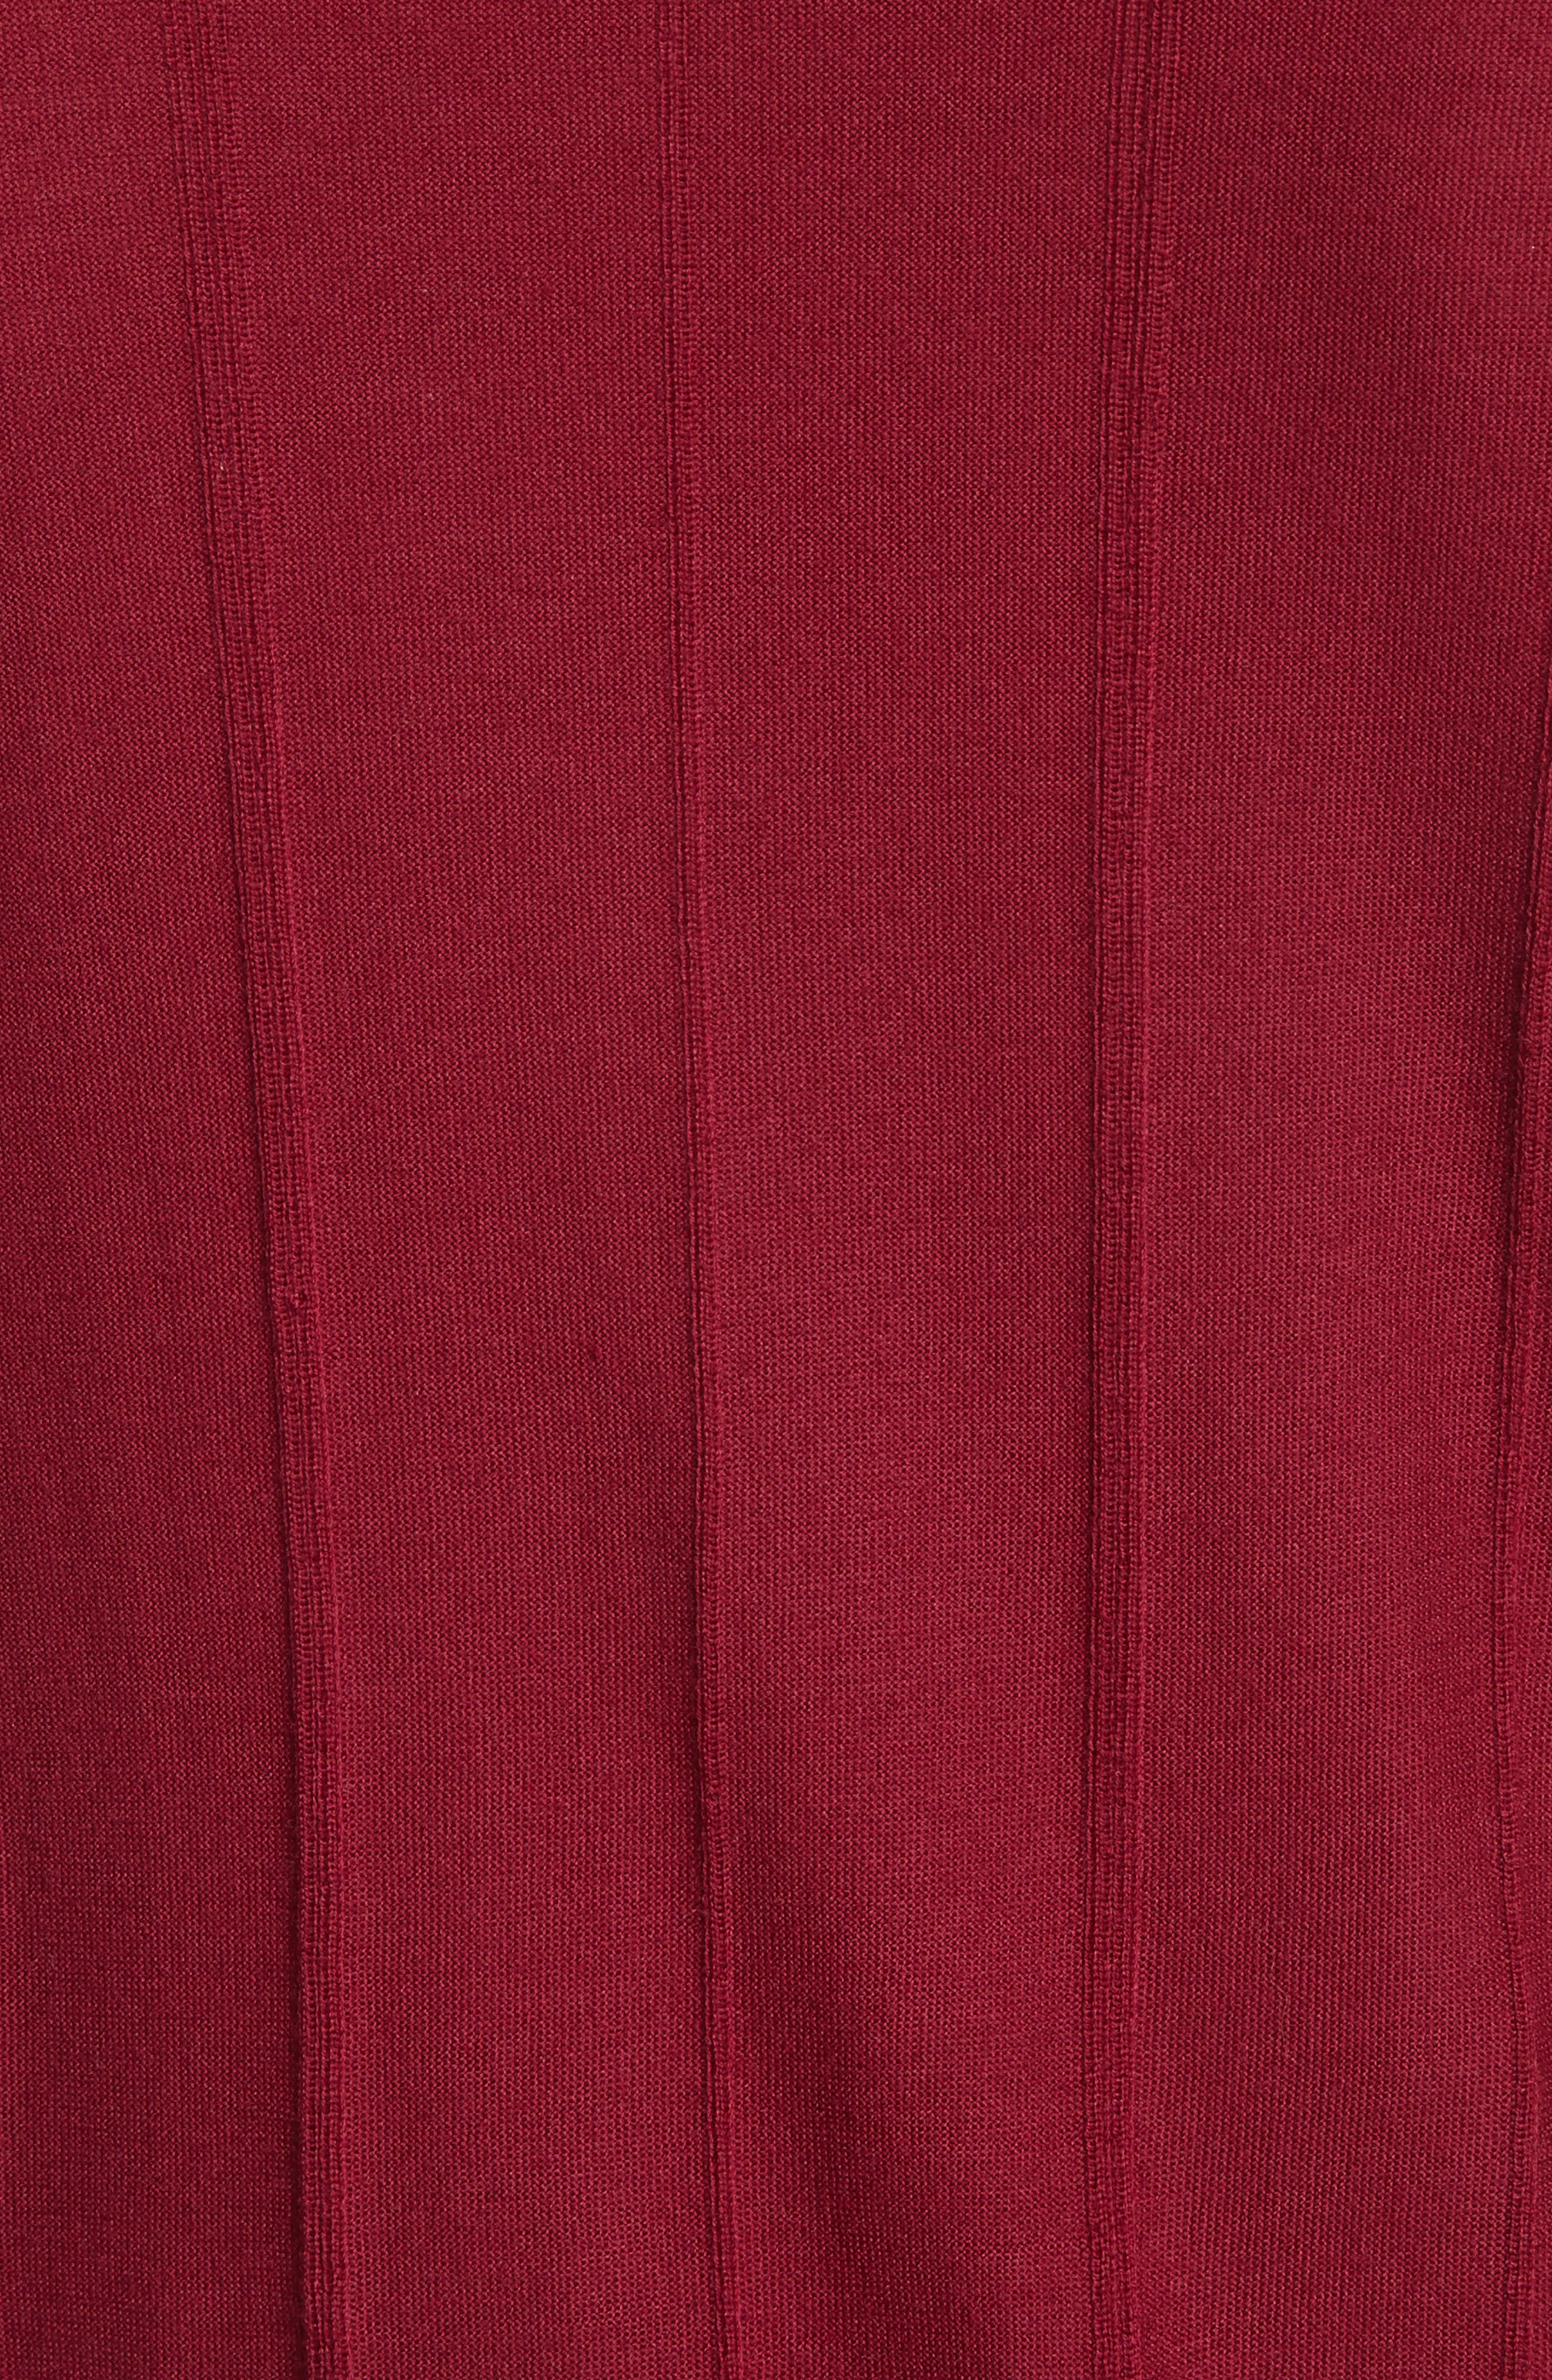 Slim Fit Wool Crewneck Sweater,                             Alternate thumbnail 5, color,                             Borgogna